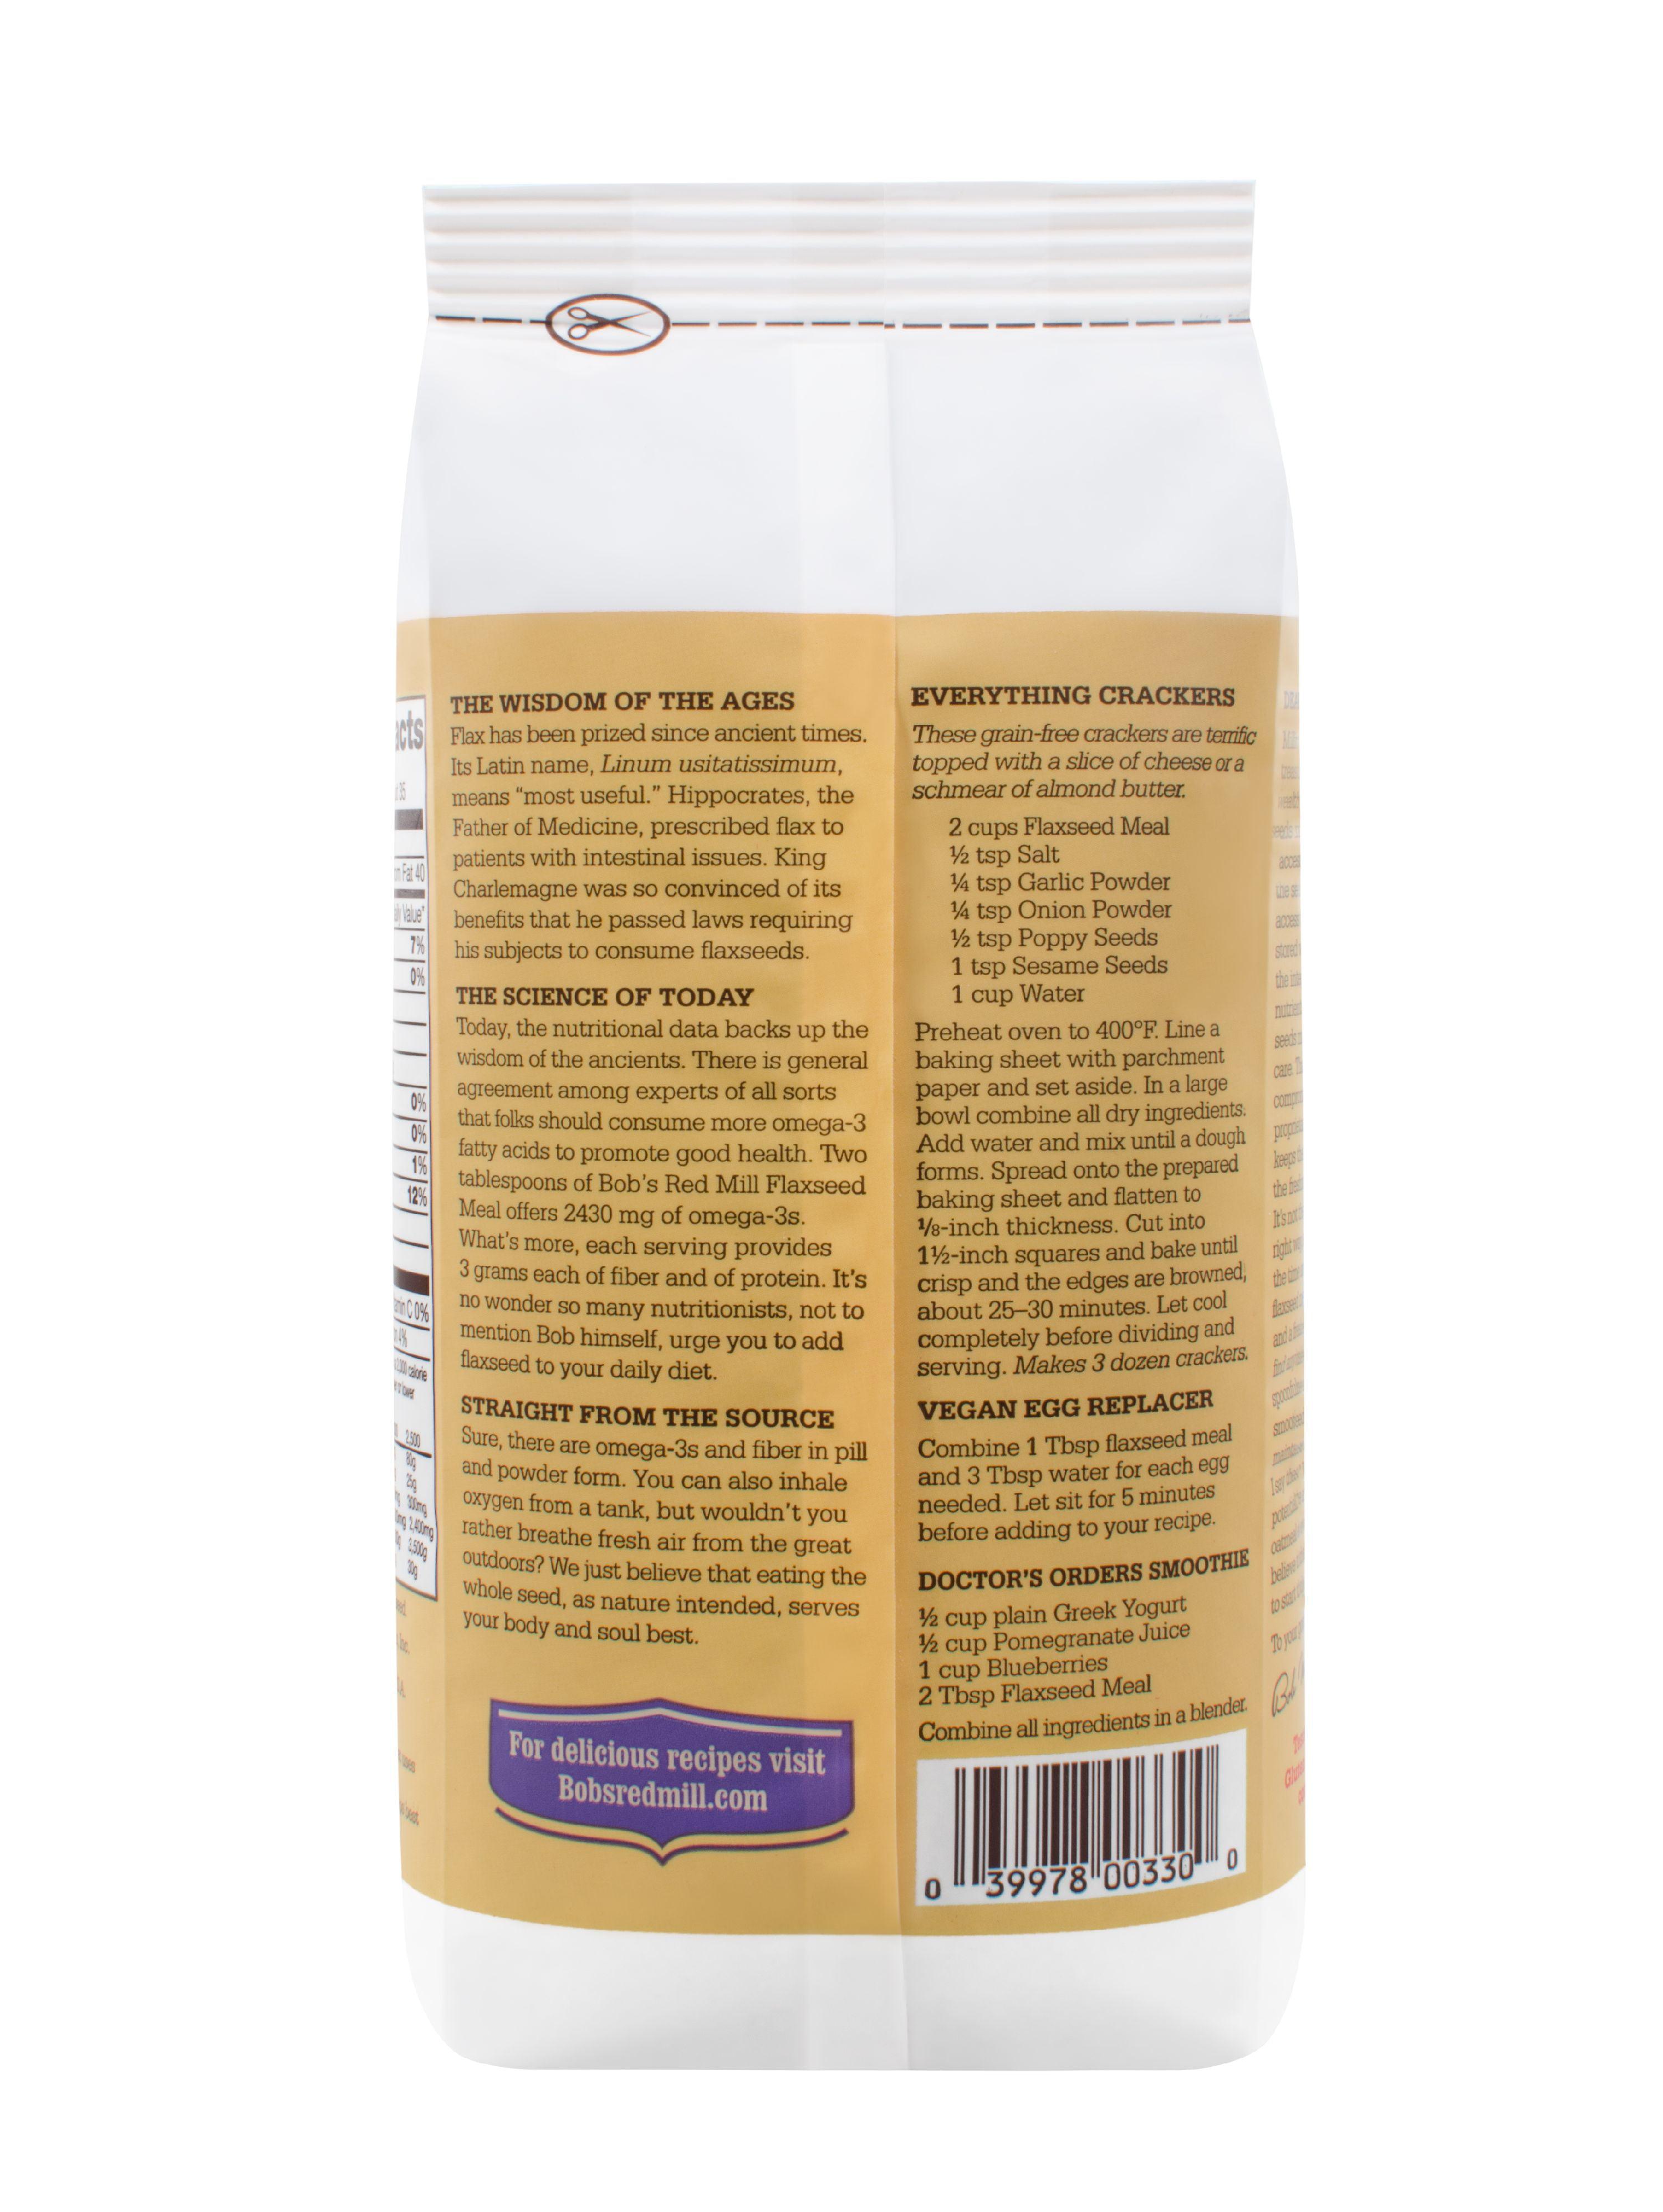 Bulk flax seed for crafts - Bulk Flax Seed For Crafts 58